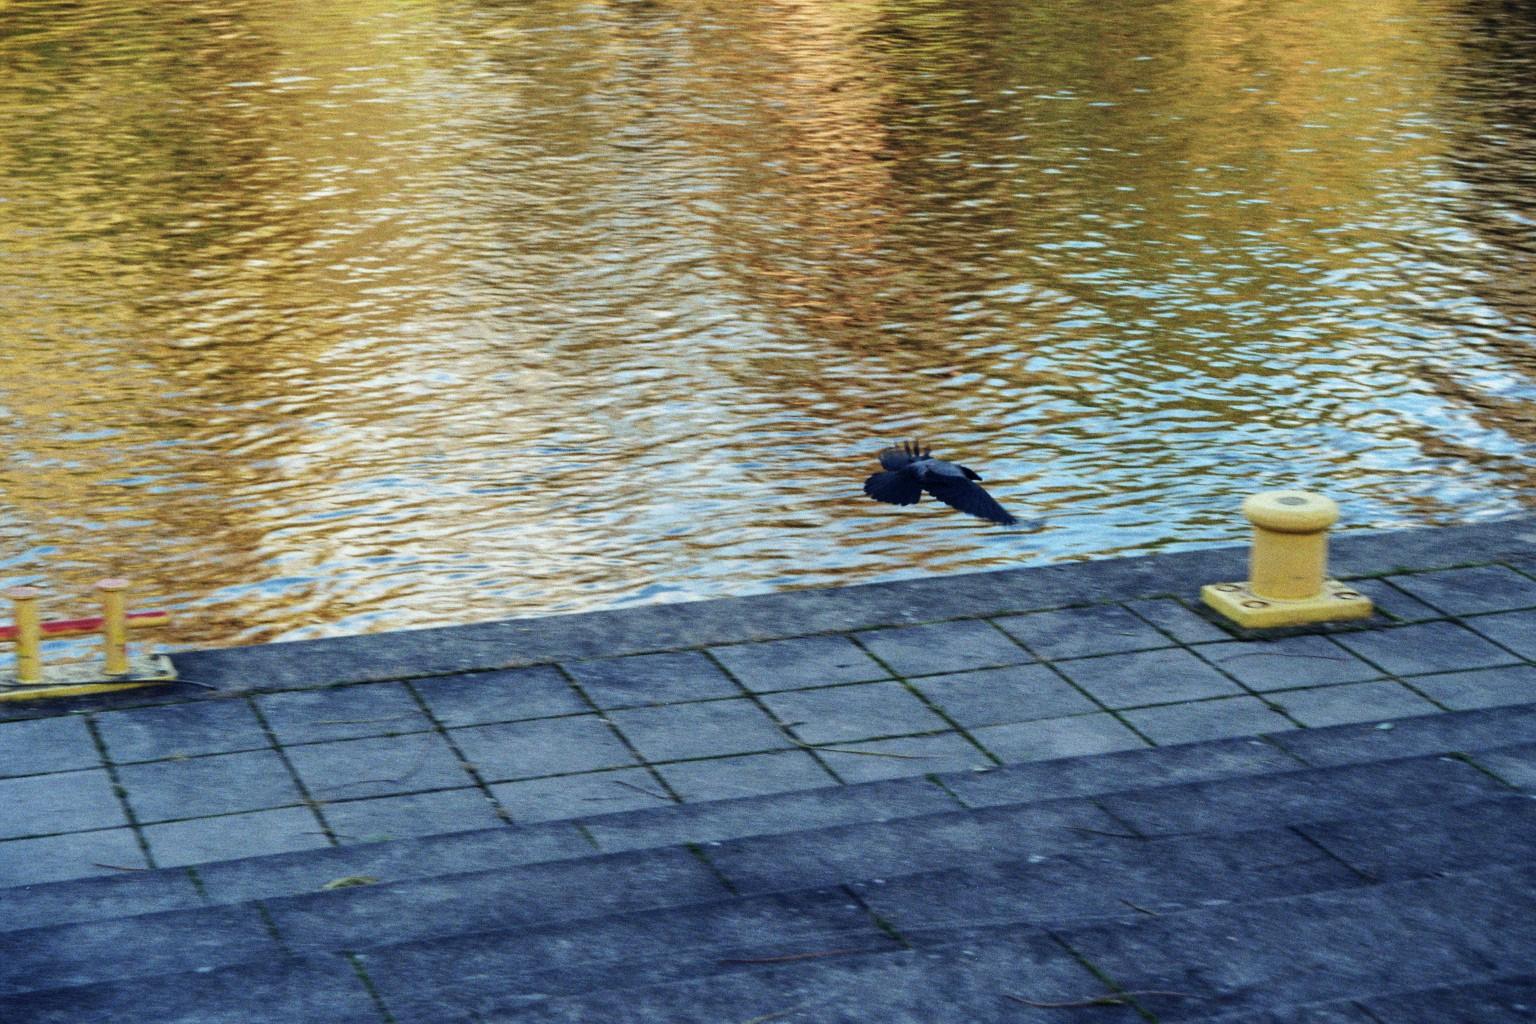 Krähe am Havelufer